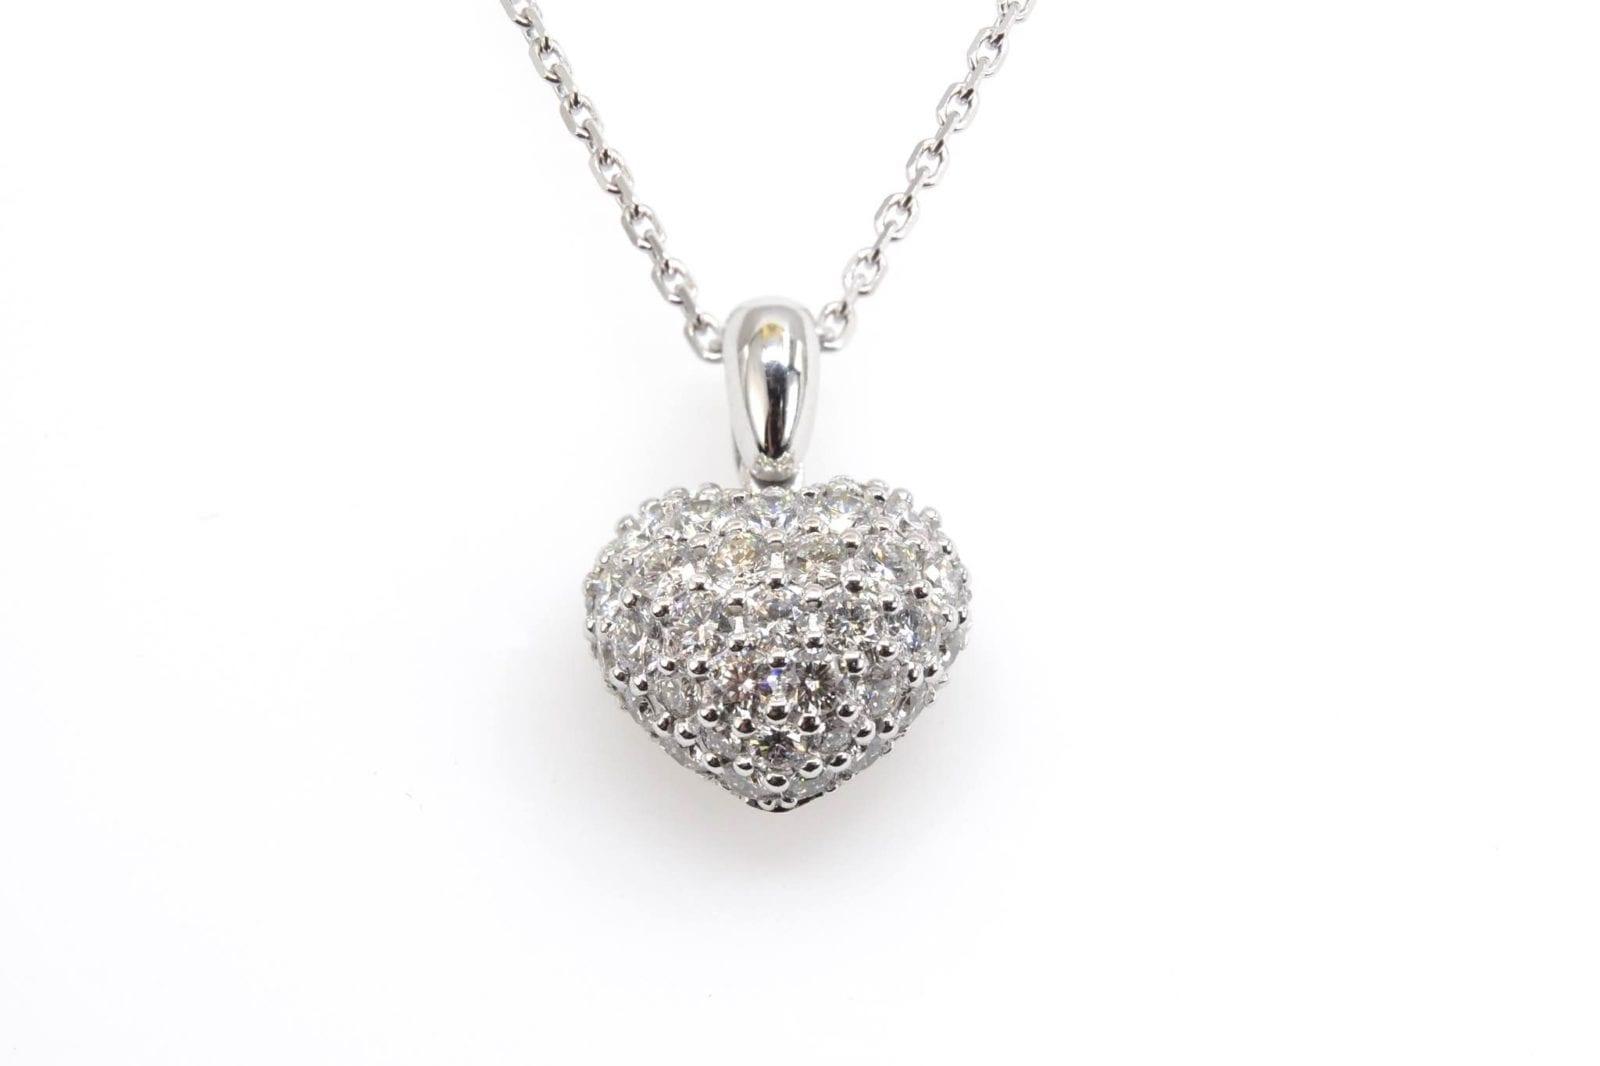 pendentif coeur Chopard diamants